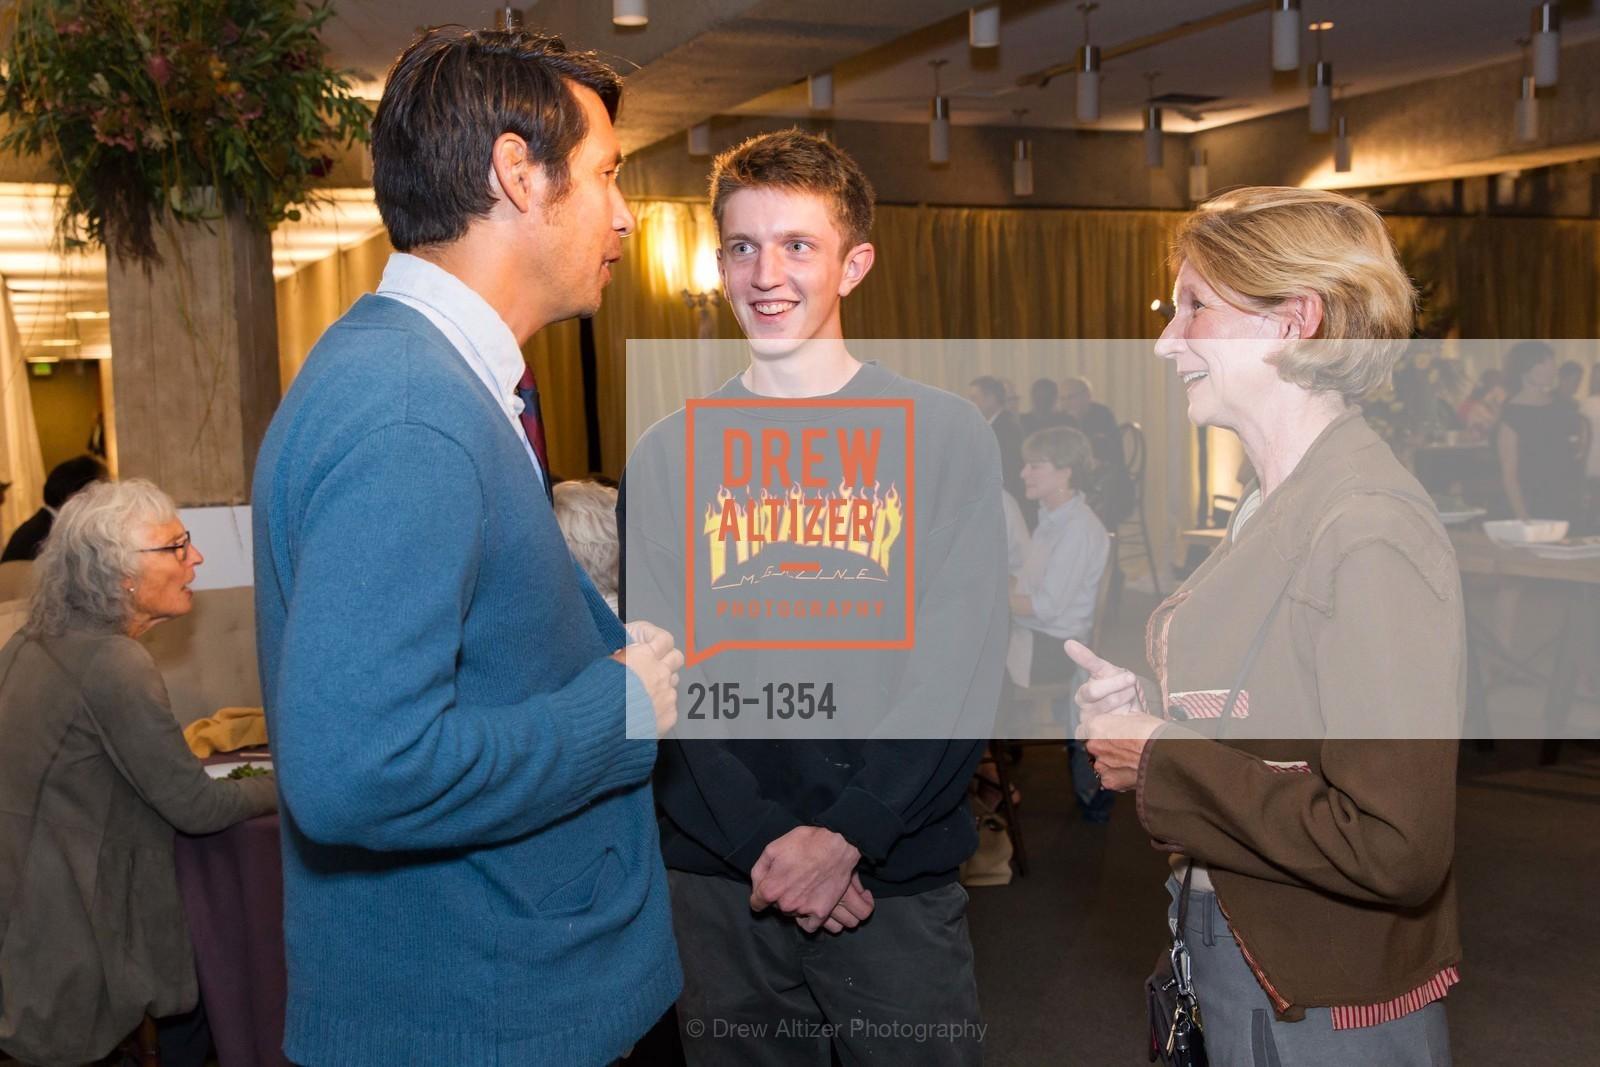 Raymond Virgel, Brem Finnie, Penelope Finnie, Photo #215-1354